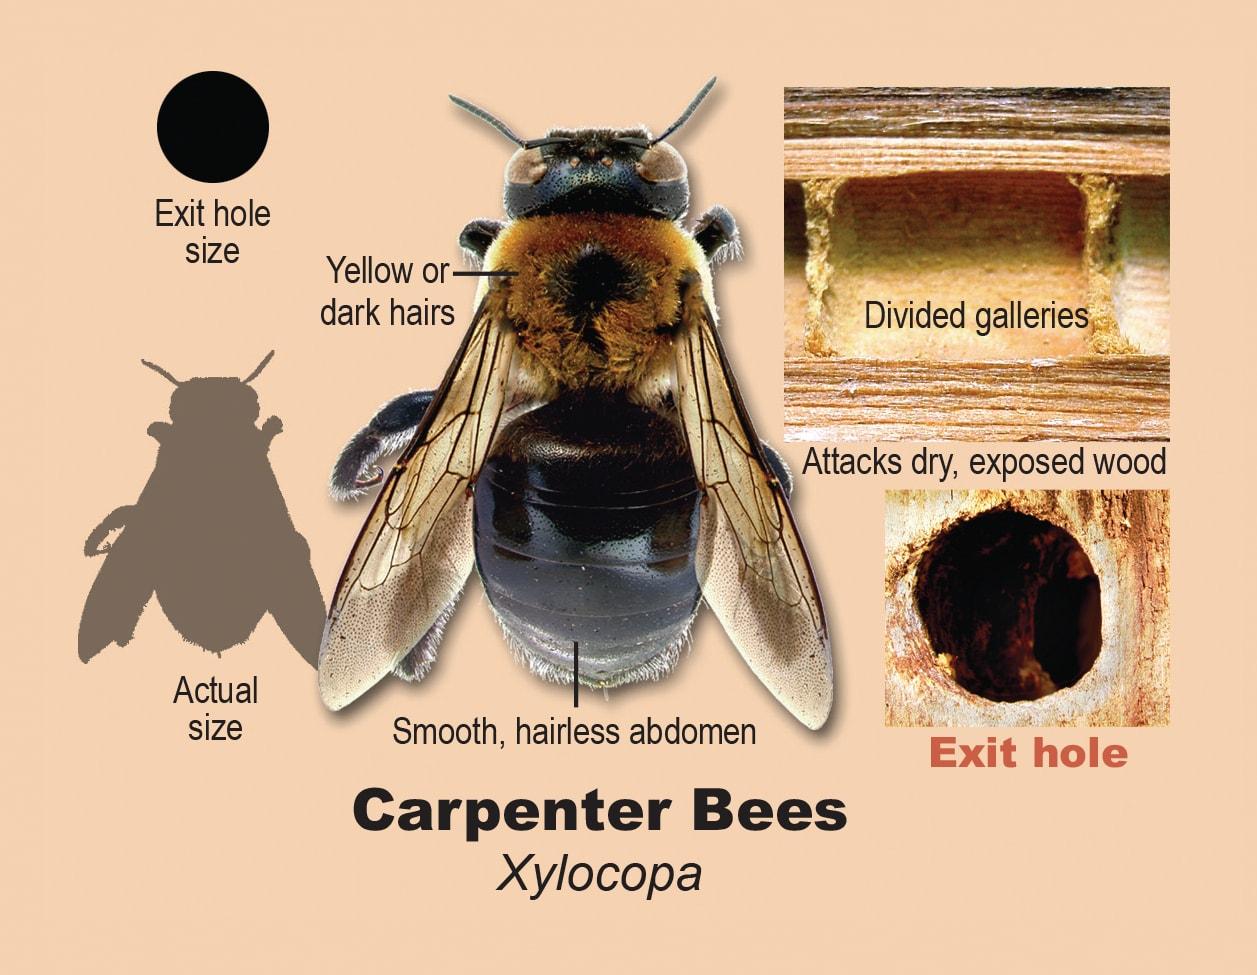 Carpenter bees.